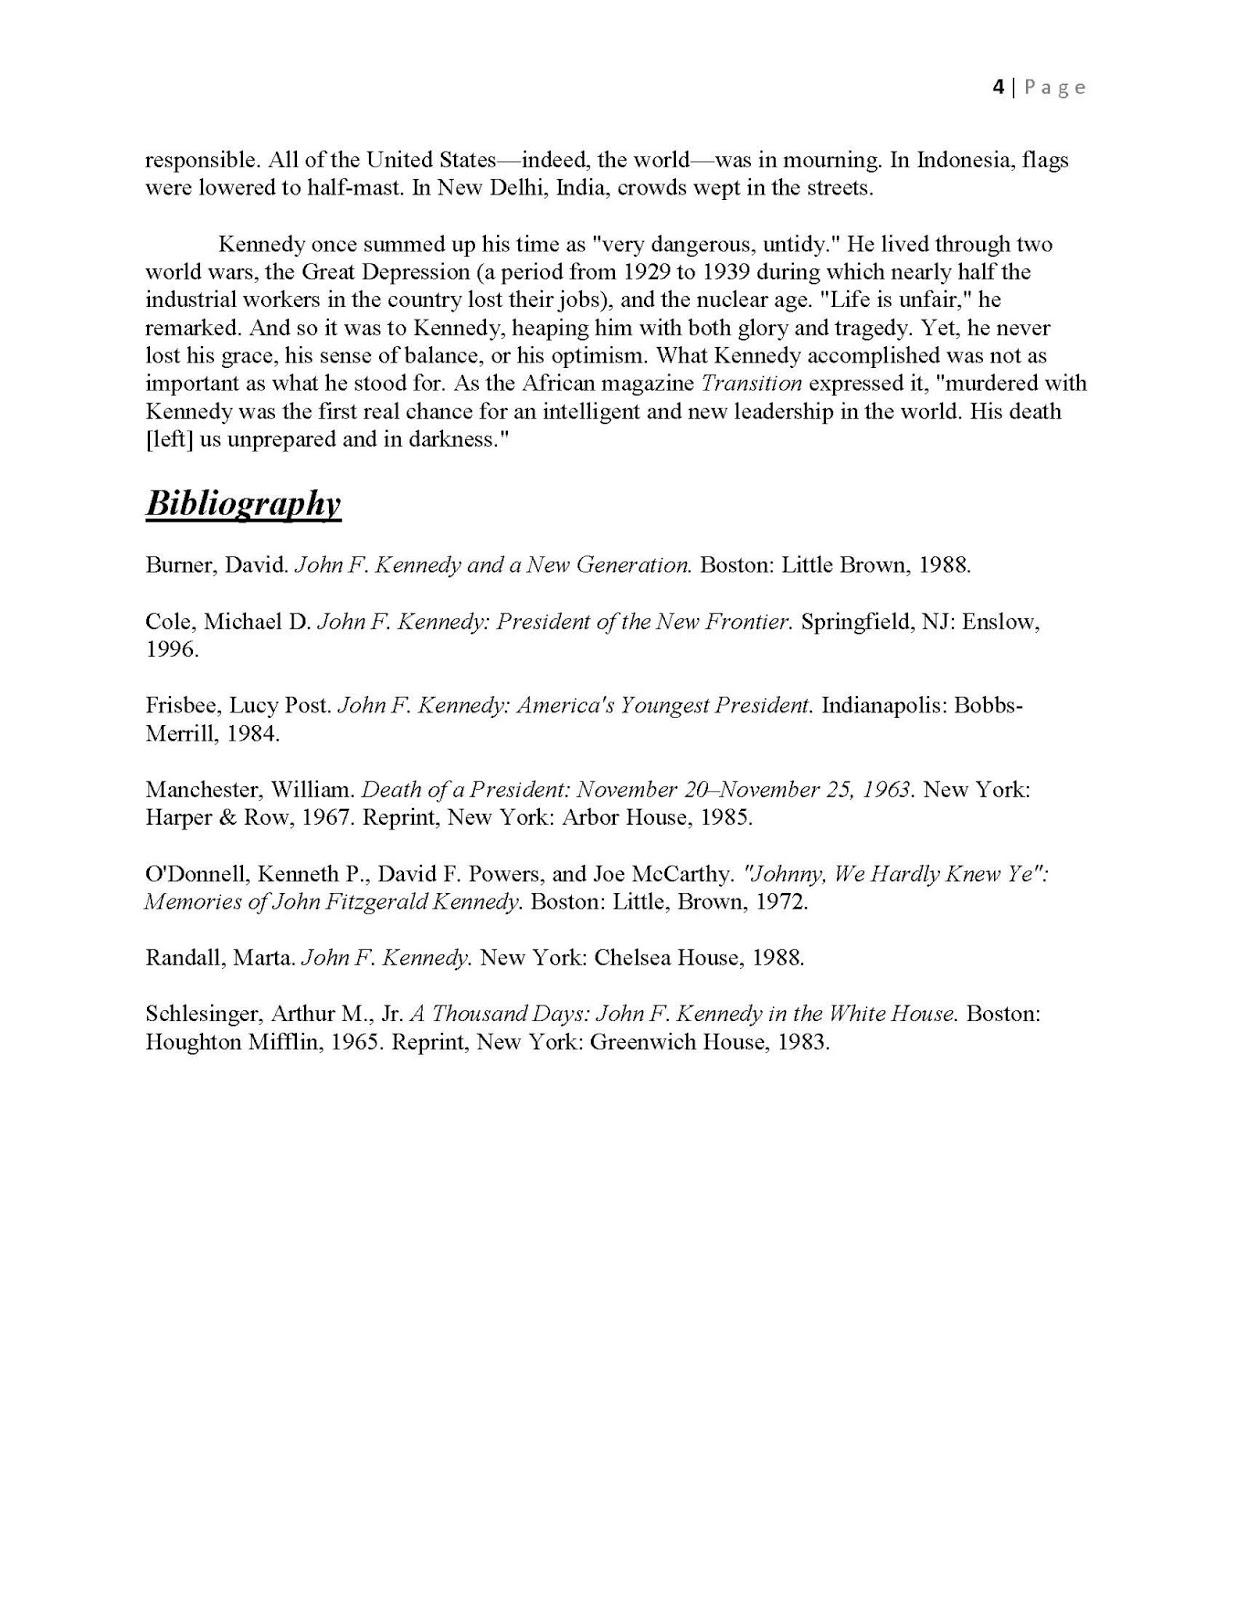 010 Vcu Essay Prompt College Prompts Jfkmlashortformbiographyreportexample P Personal Statement Remarkable Full